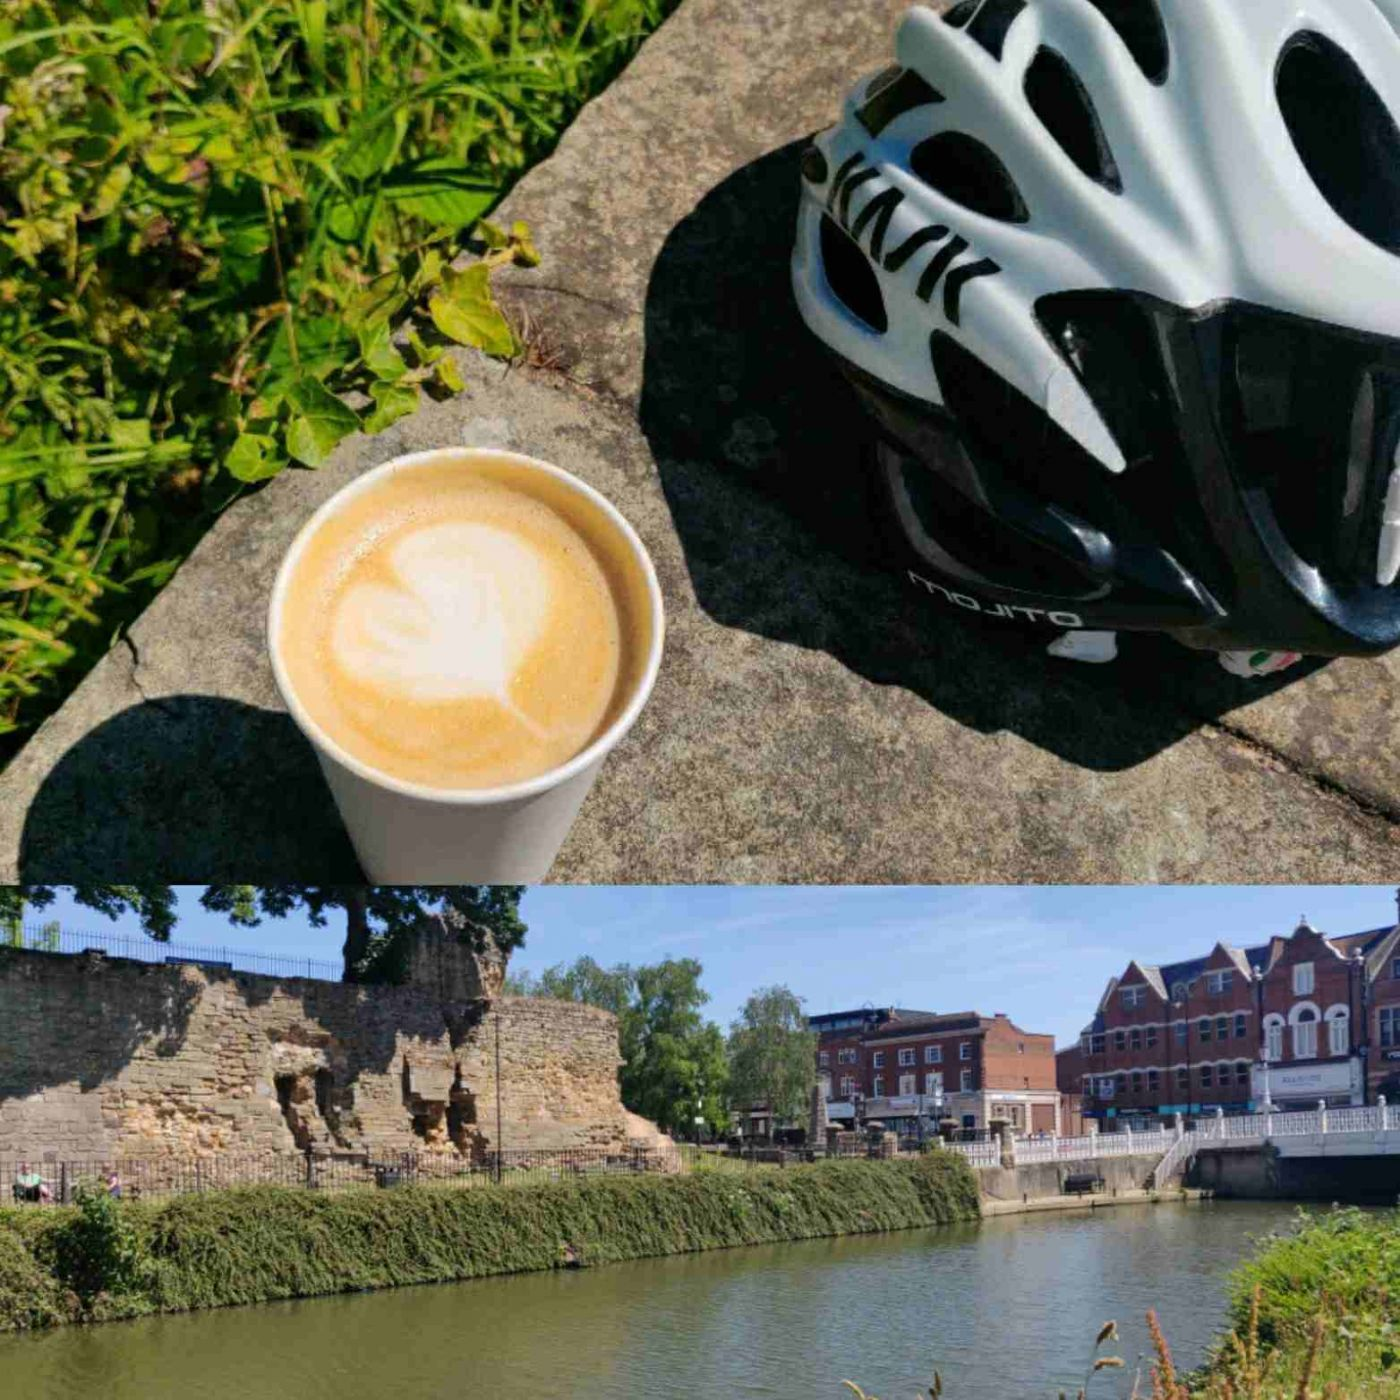 River Medway at Tonbridge and café latte